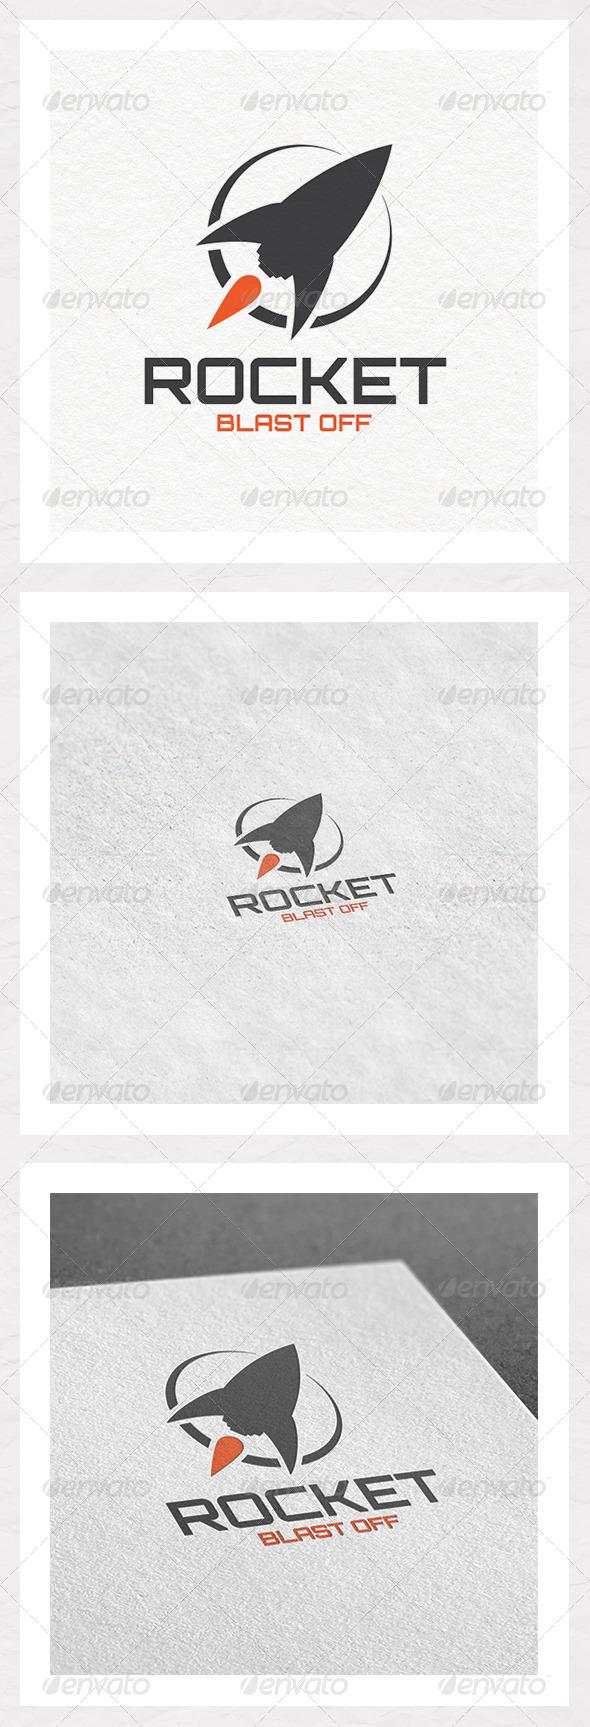 GraphicRiver Rocket Blast Off Logo 5902928